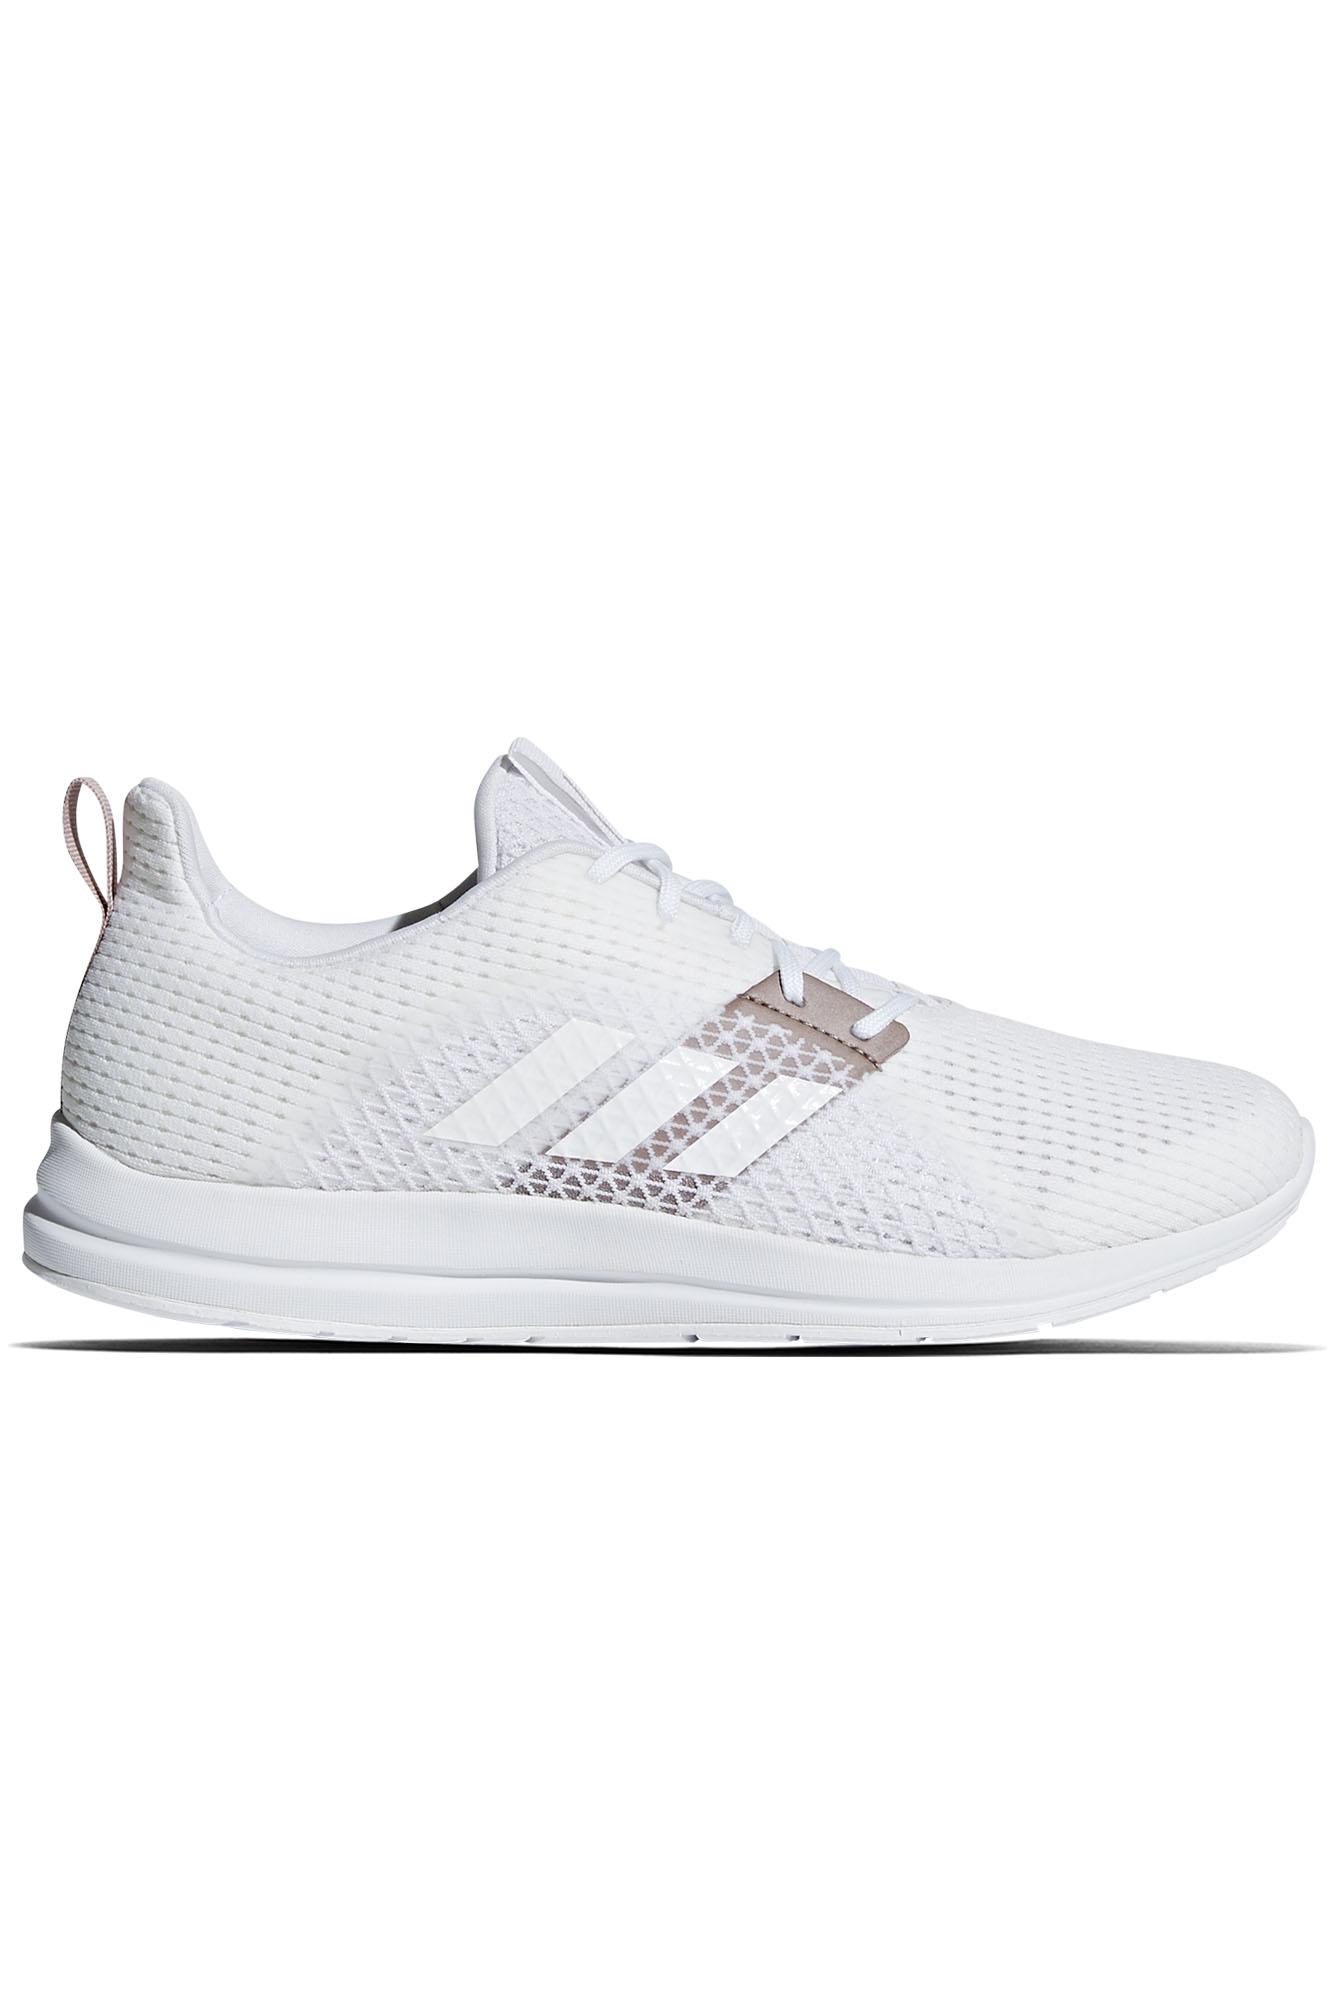 28277ce784cf ... Running Shoes  great look 7e19f 1db0f  9d40dc9ef43ba6e8cbefe9c0b4bdc062.jpg ...